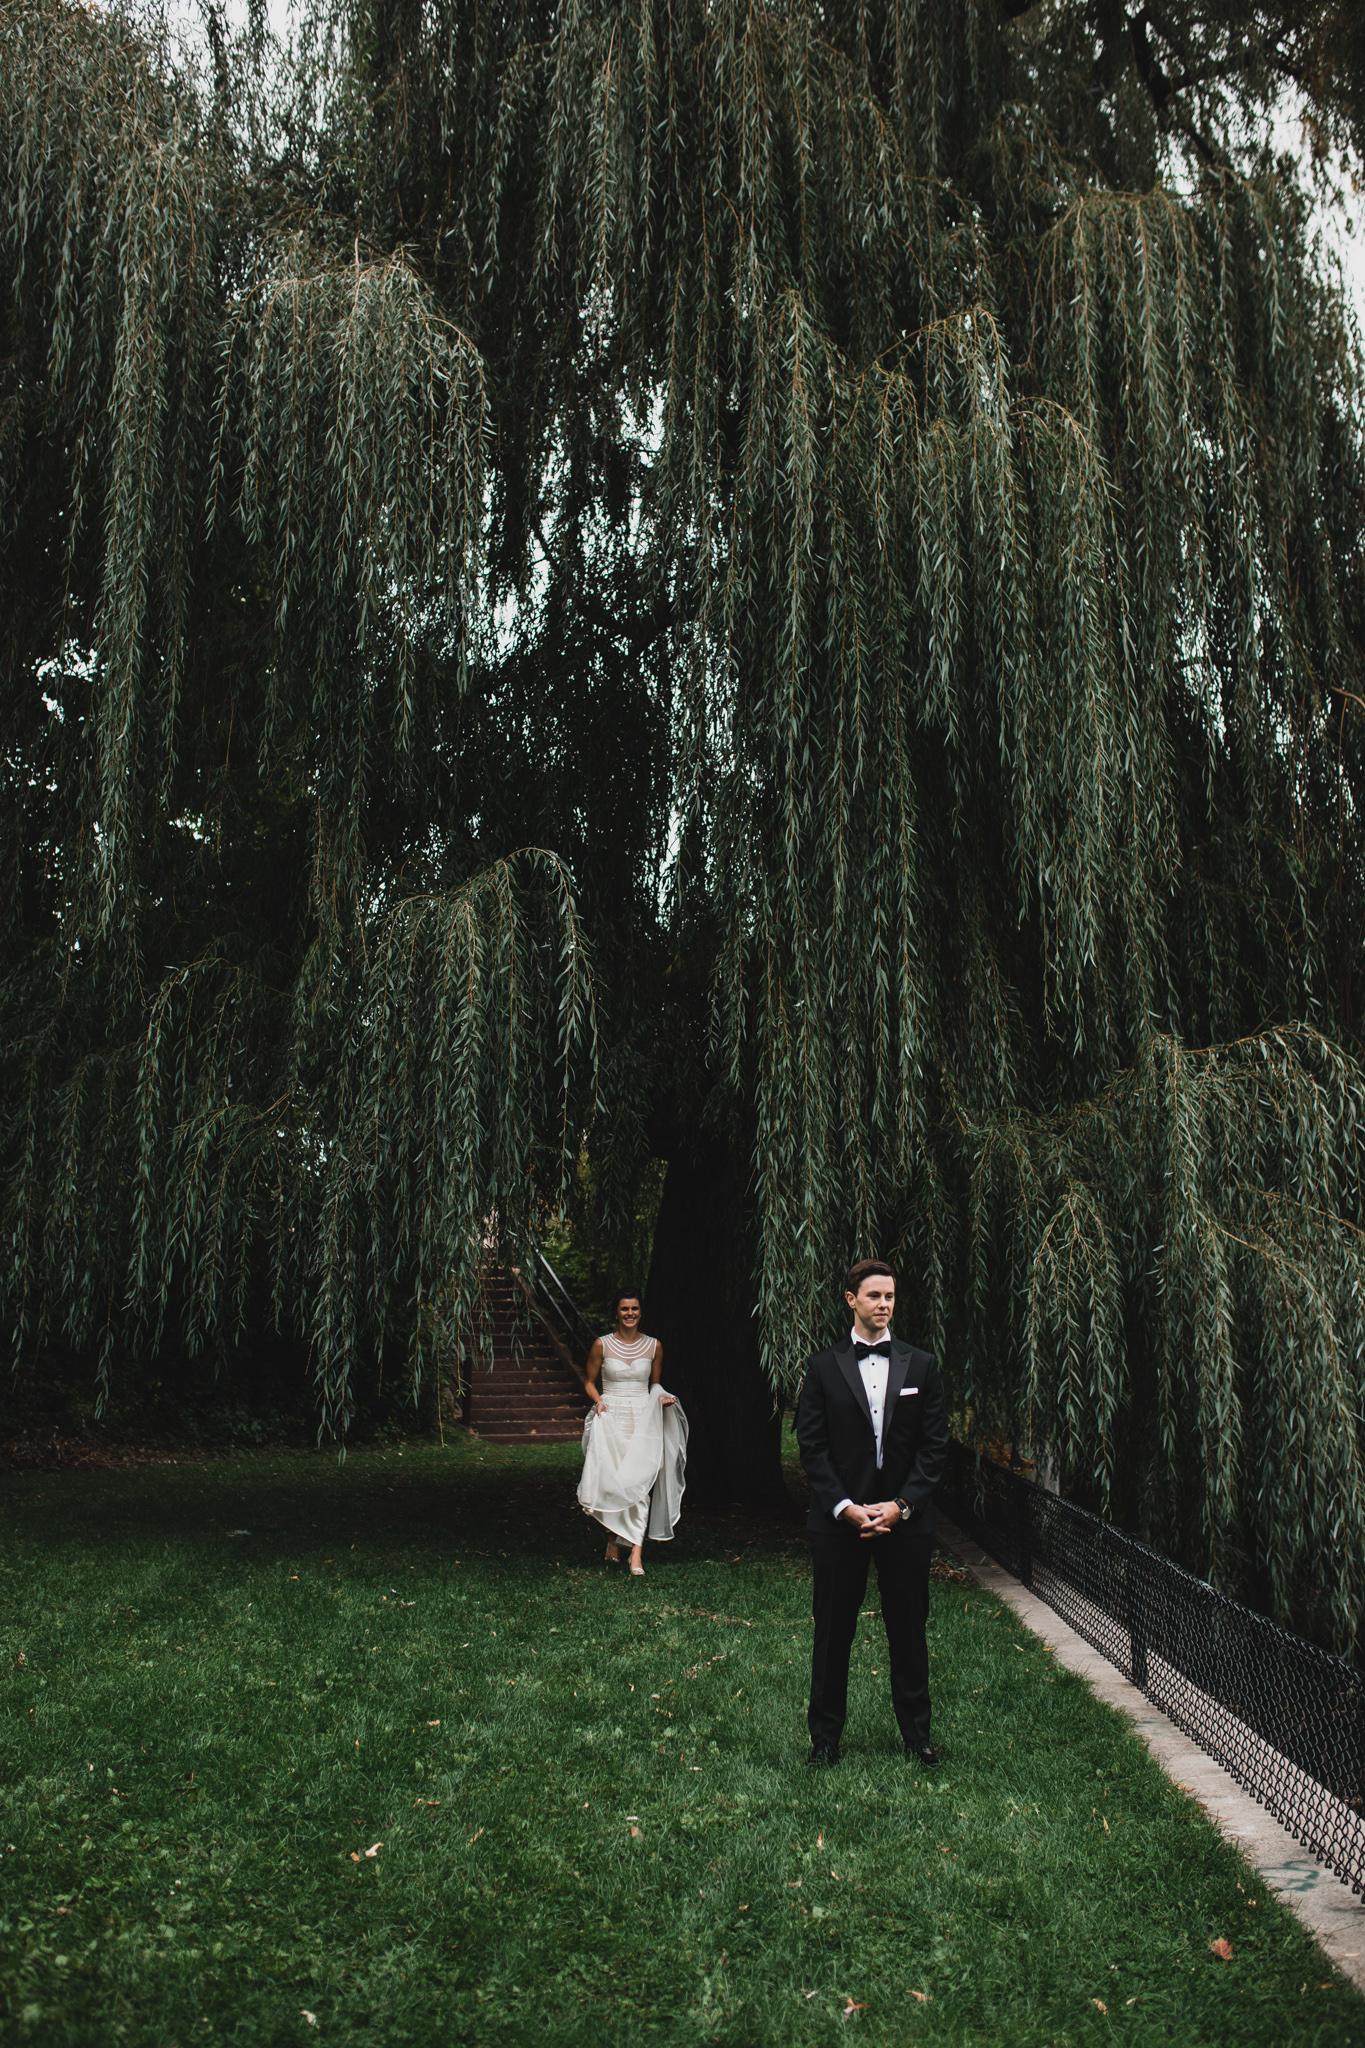 164-WEB-Jonathan-Kuhn-Photography-Amanda-Brennan-Wedding-0052.jpg